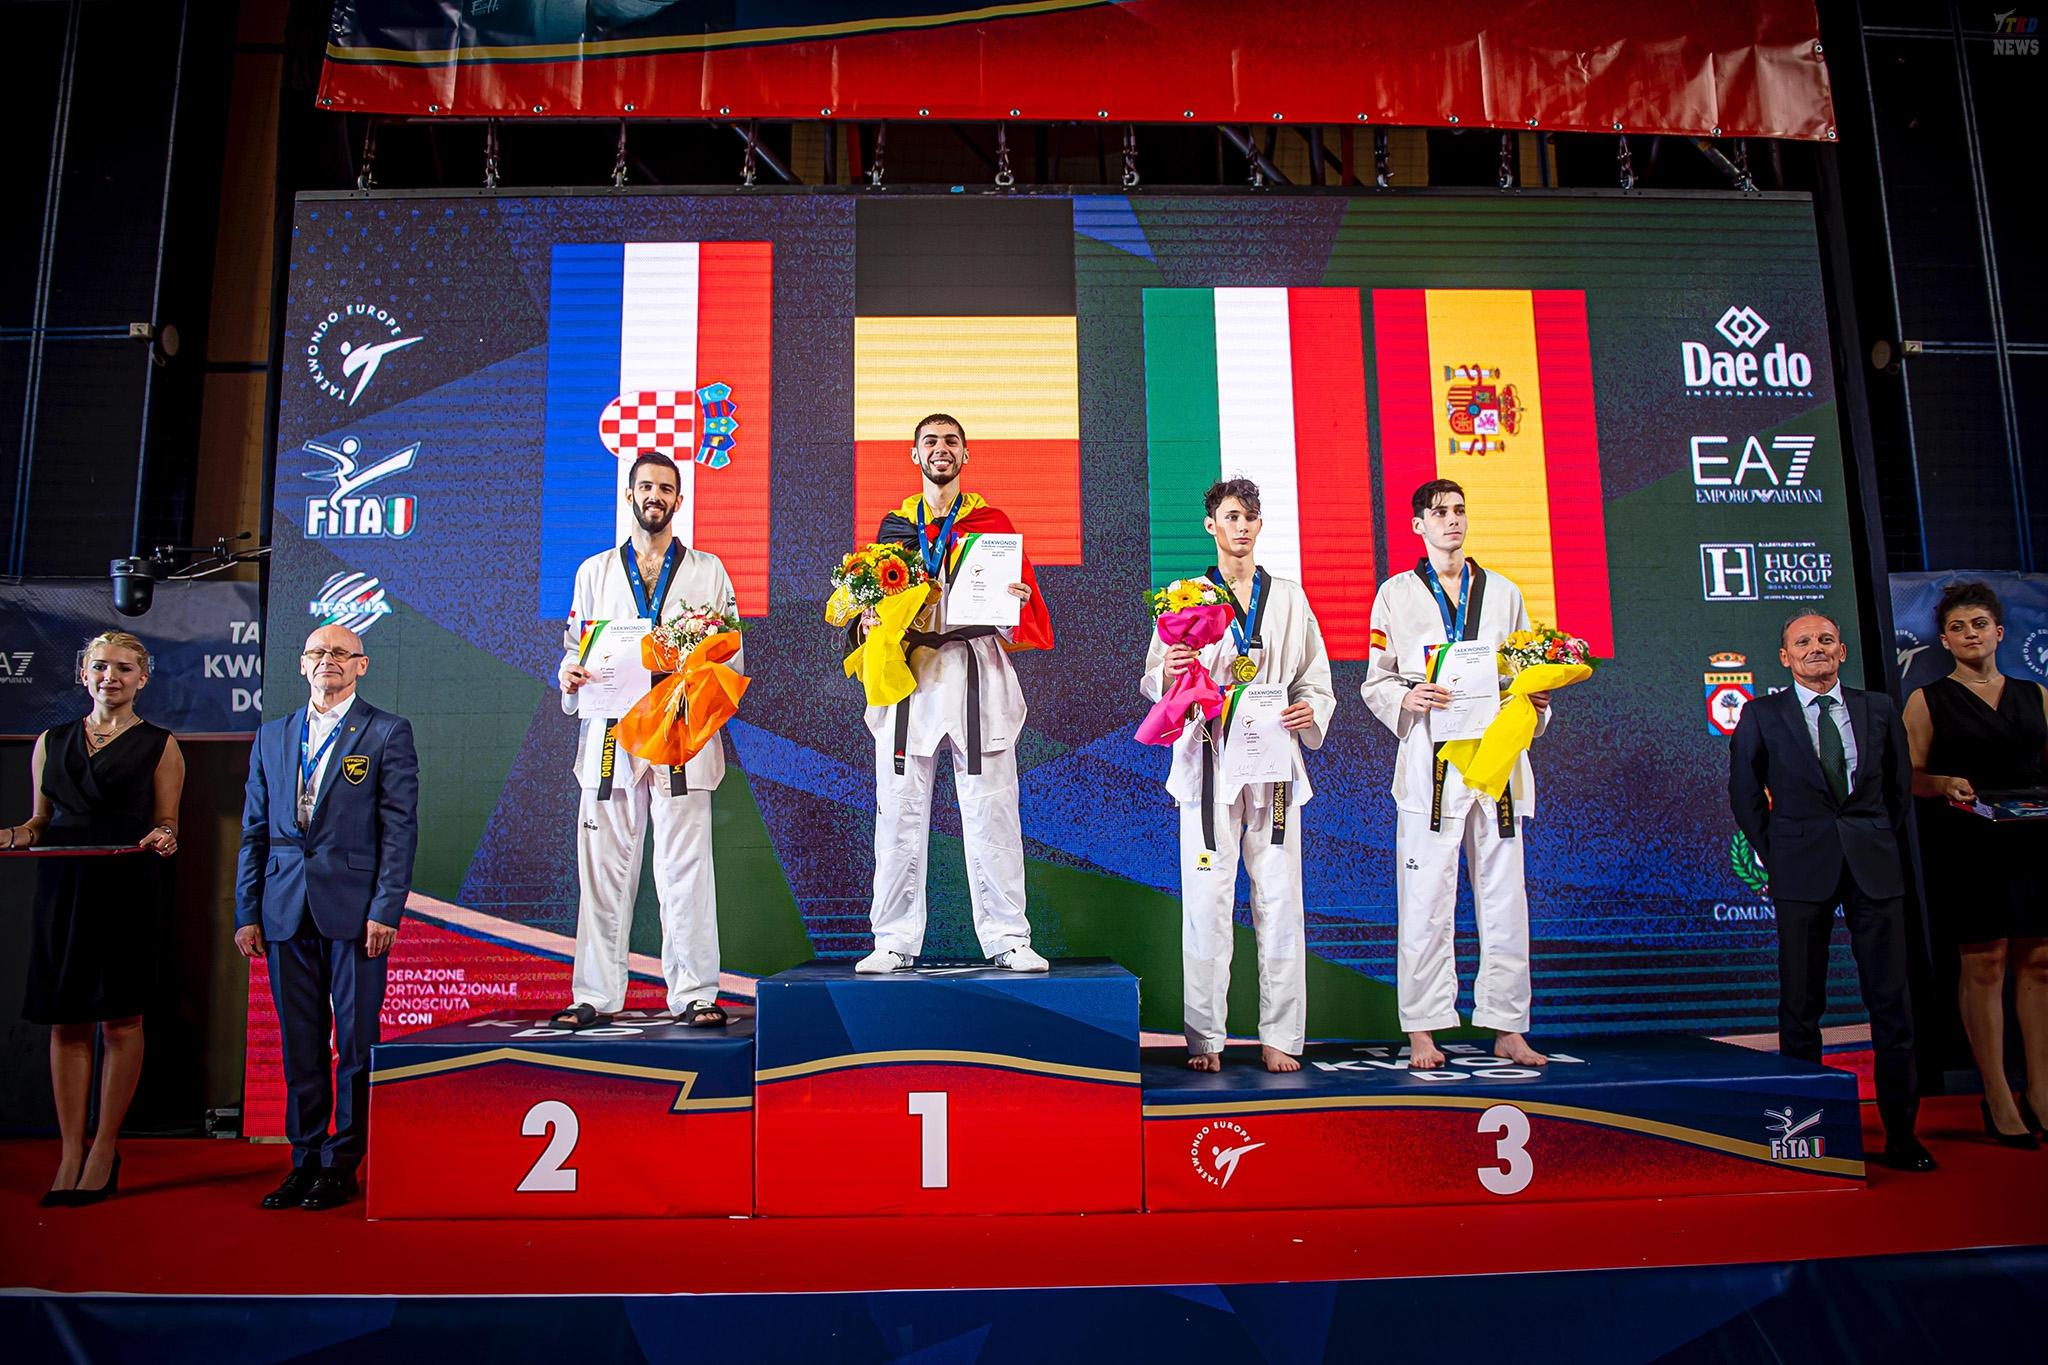 1572790028_male-63b_g4-extra-european-taekwondo-championships-bari-2019